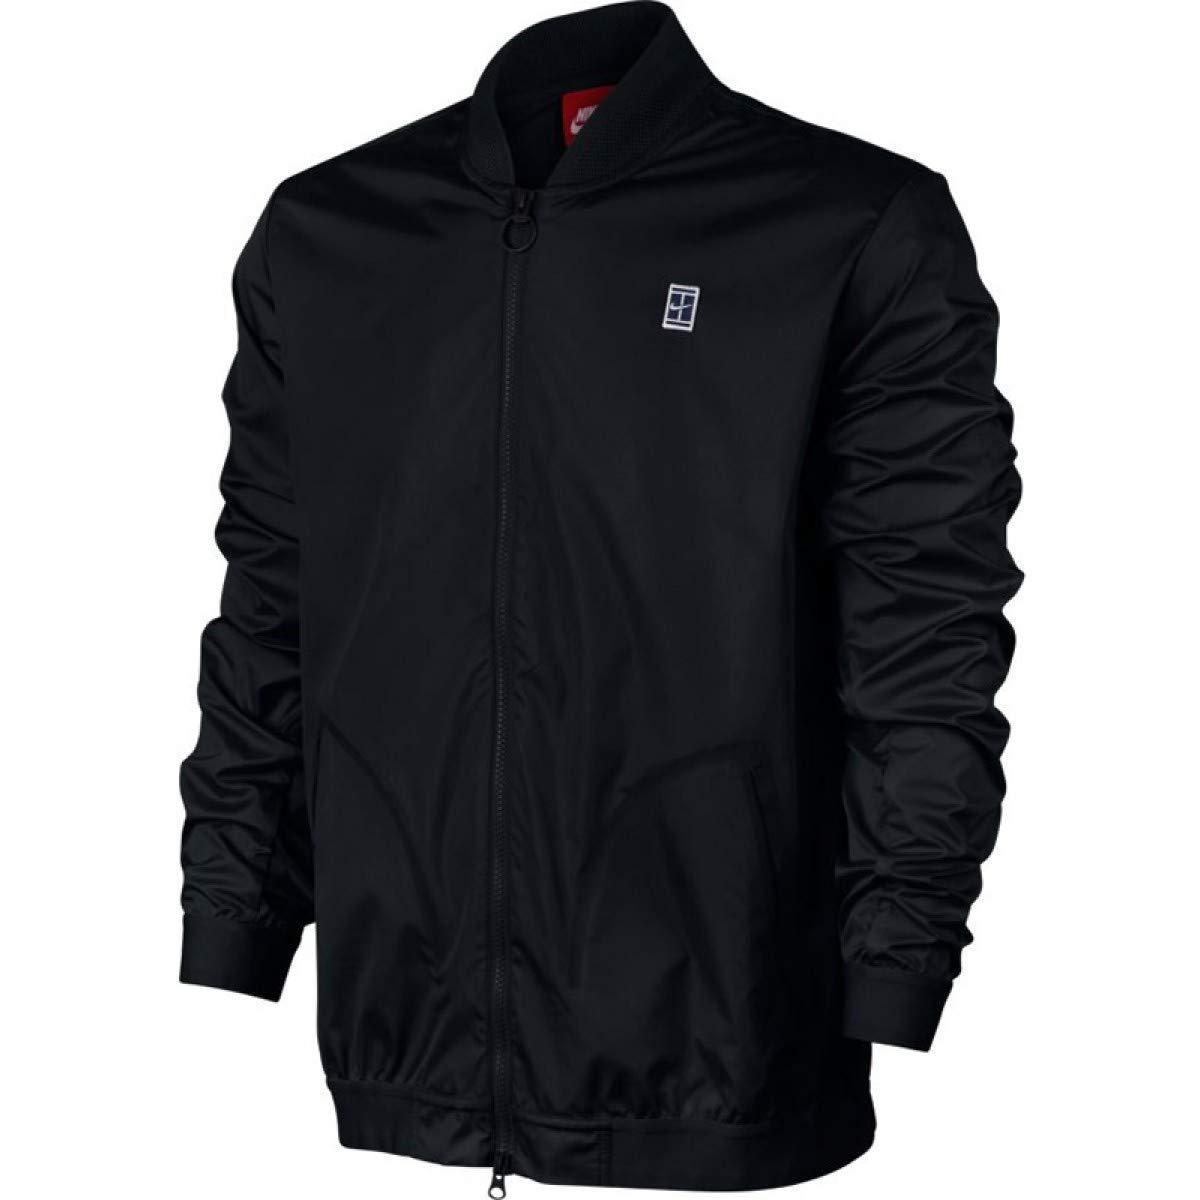 Nike Men's Court Bomber Tennis Jacket (Small, Black/White)